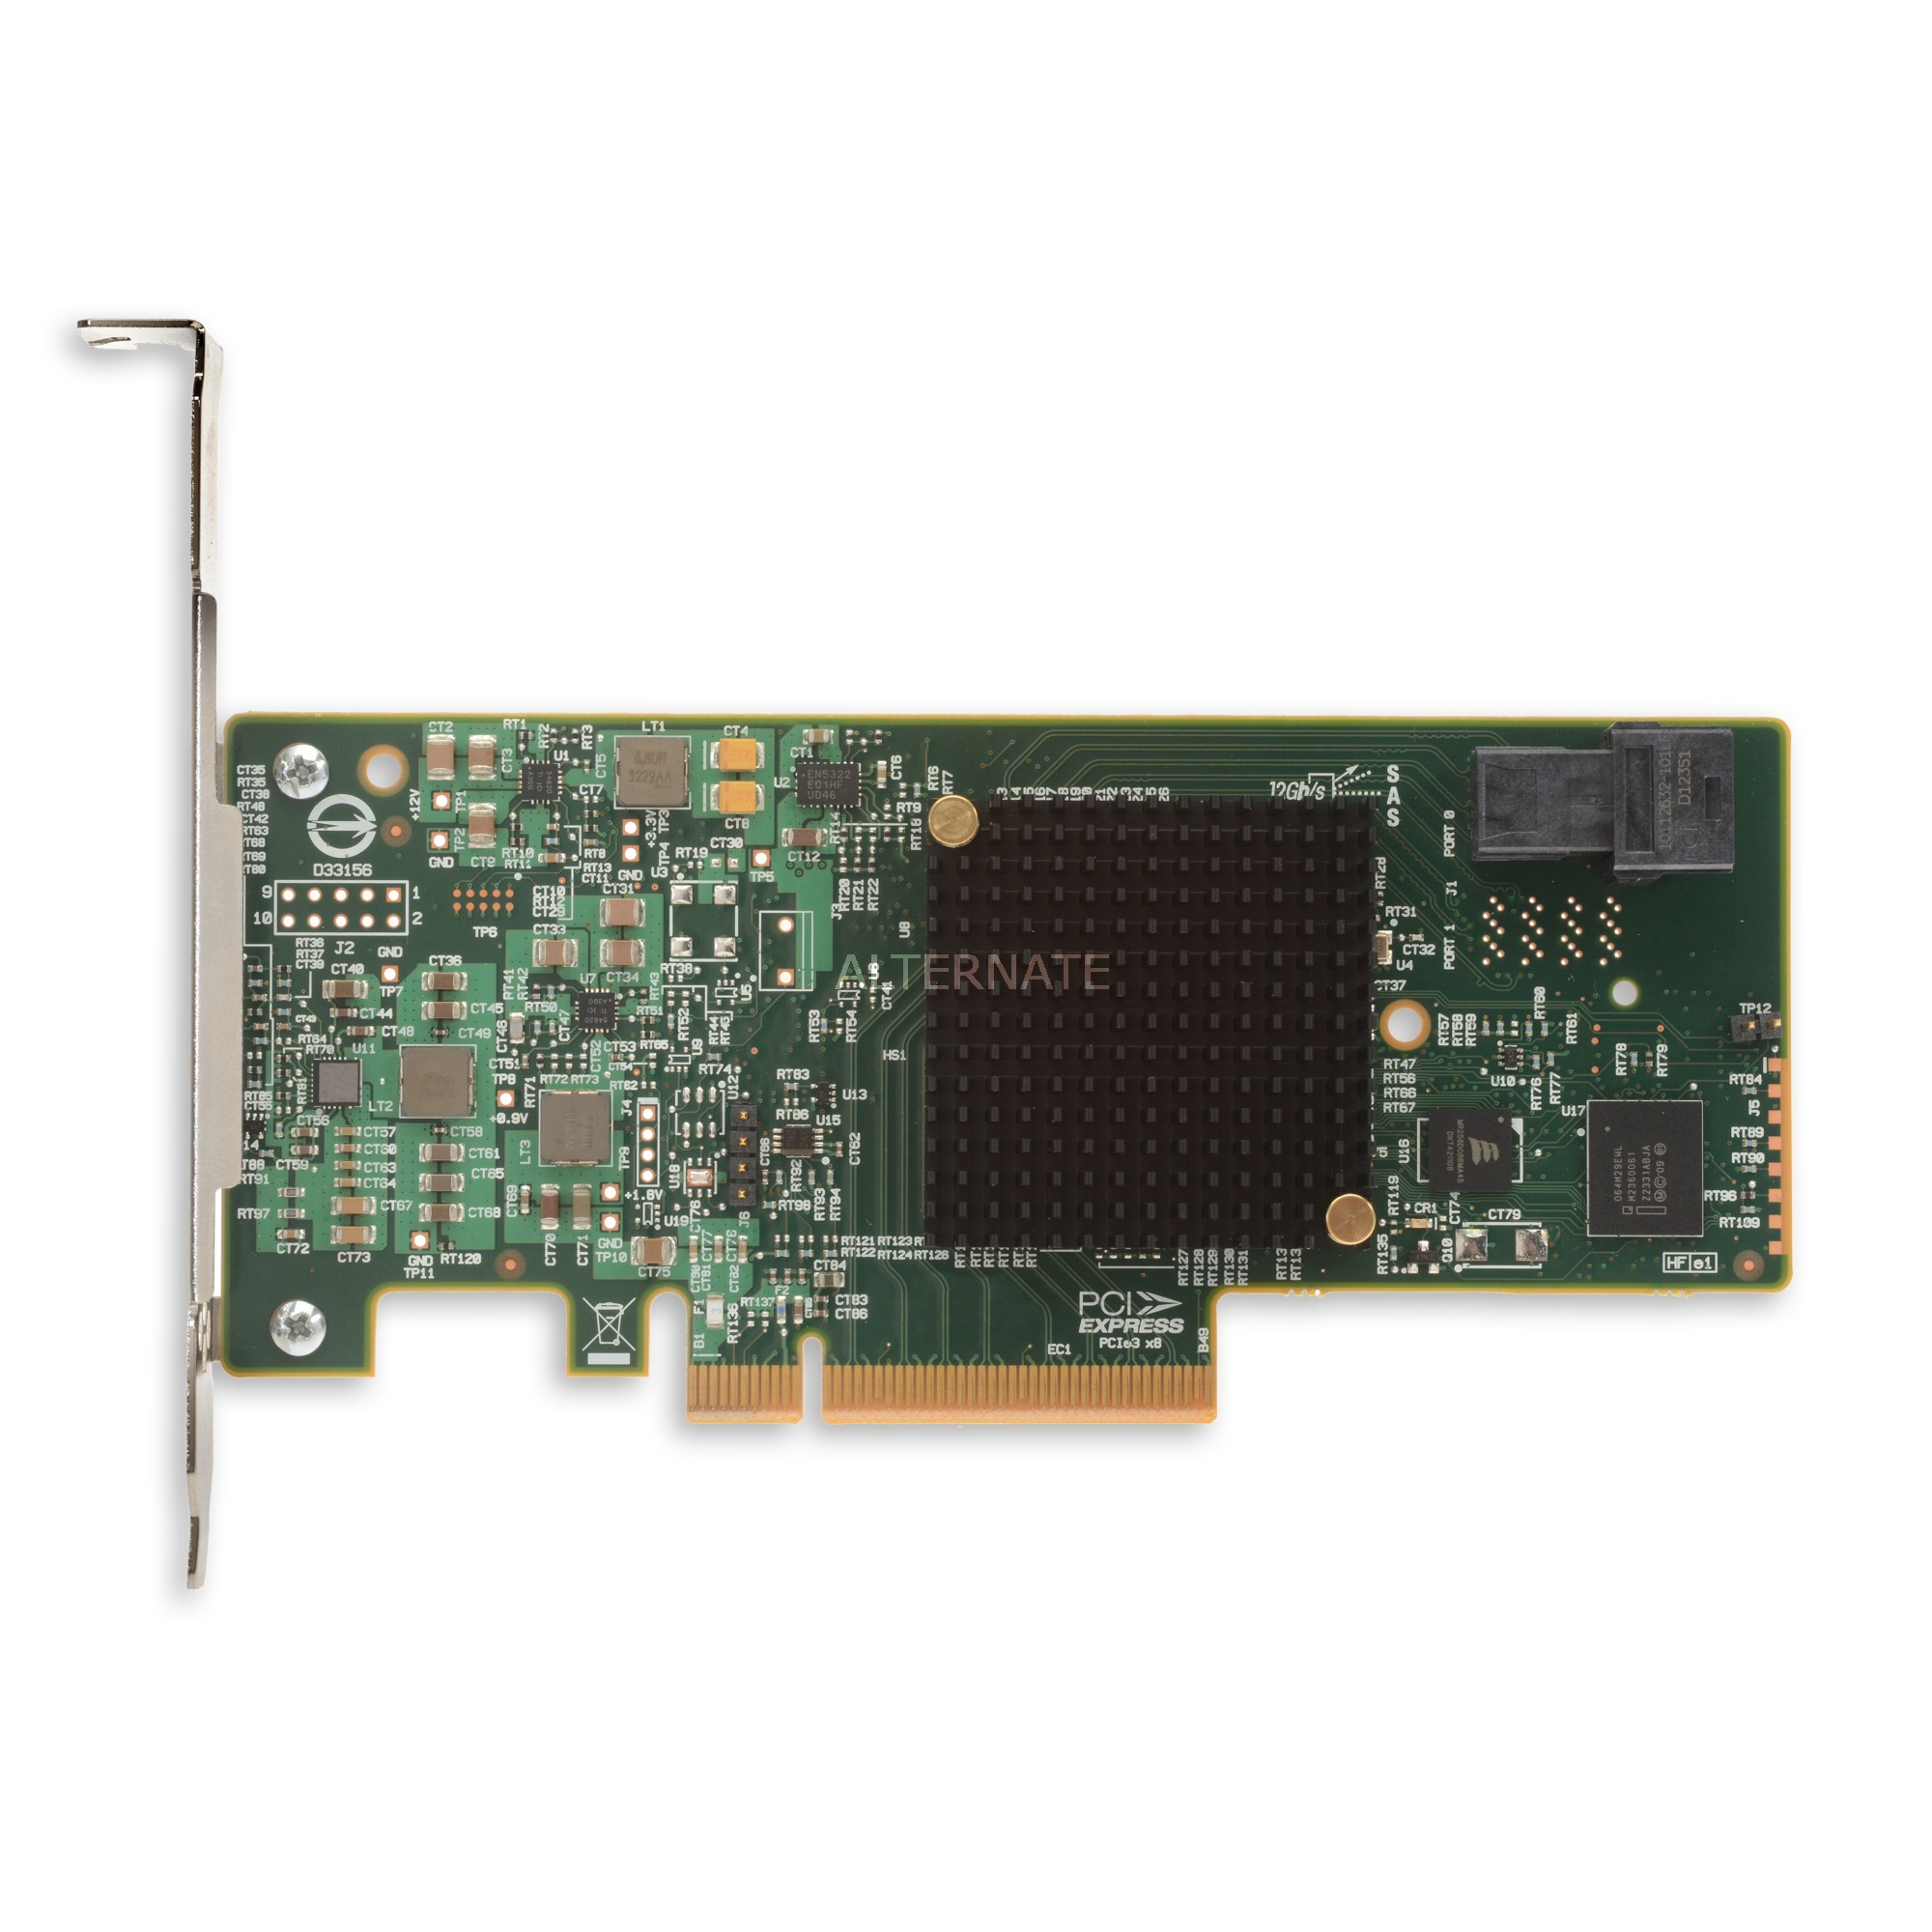 SAS 9300-4i tarjeta y adaptador de interfaz SAS,SATA Interno, Controlador